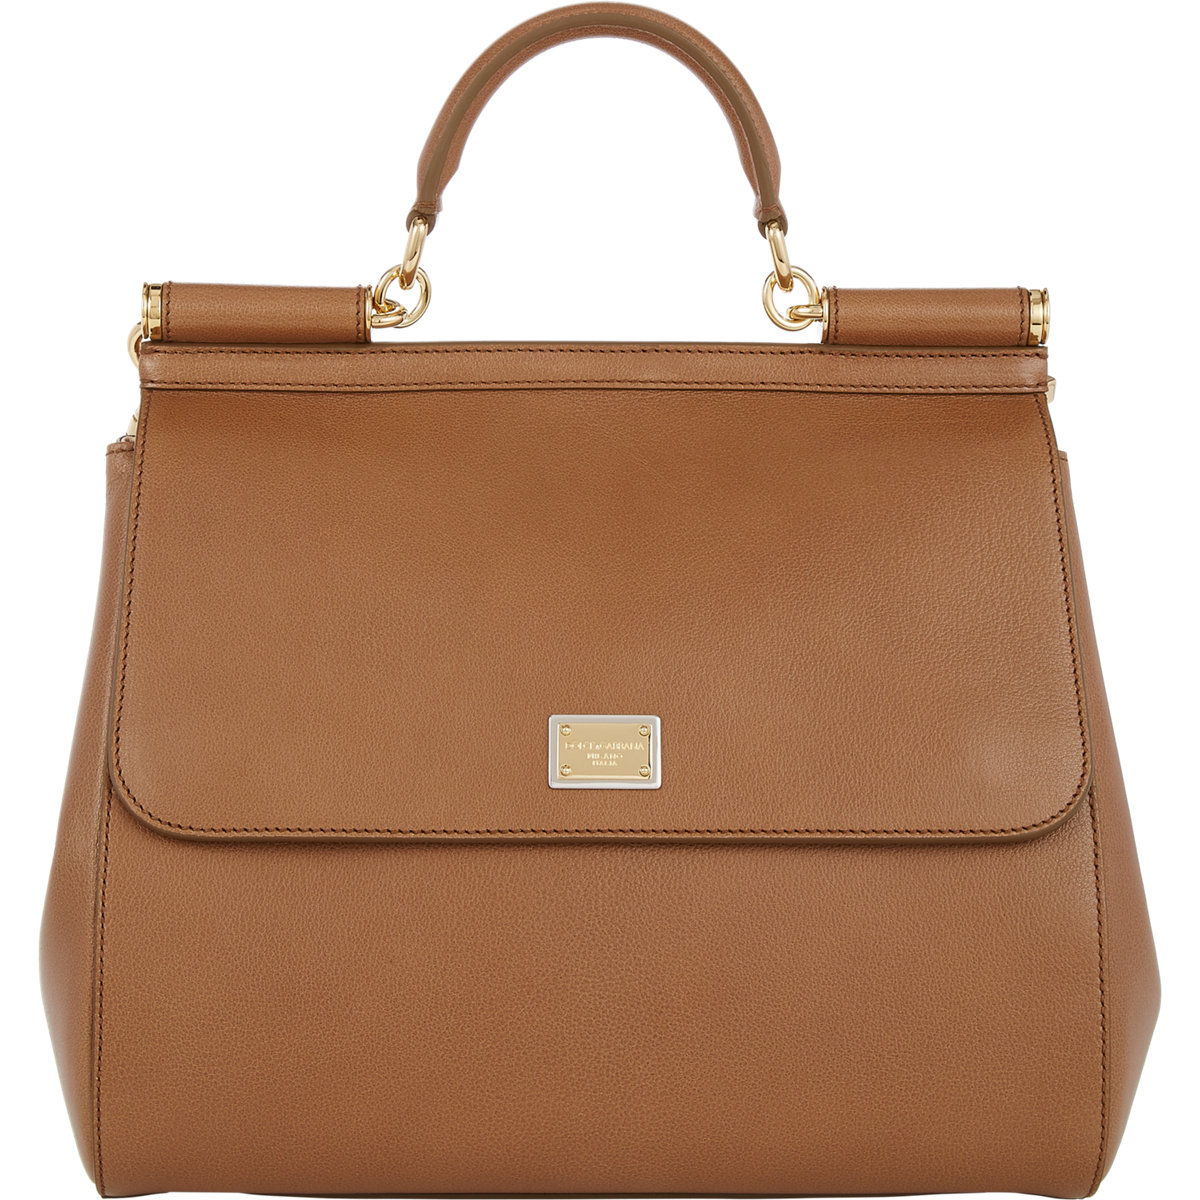 Sale Official Sicily mini shoulder bag - Brown Dolce & Gabbana Sast Online New Styles Clearance Finishline VNUNcY